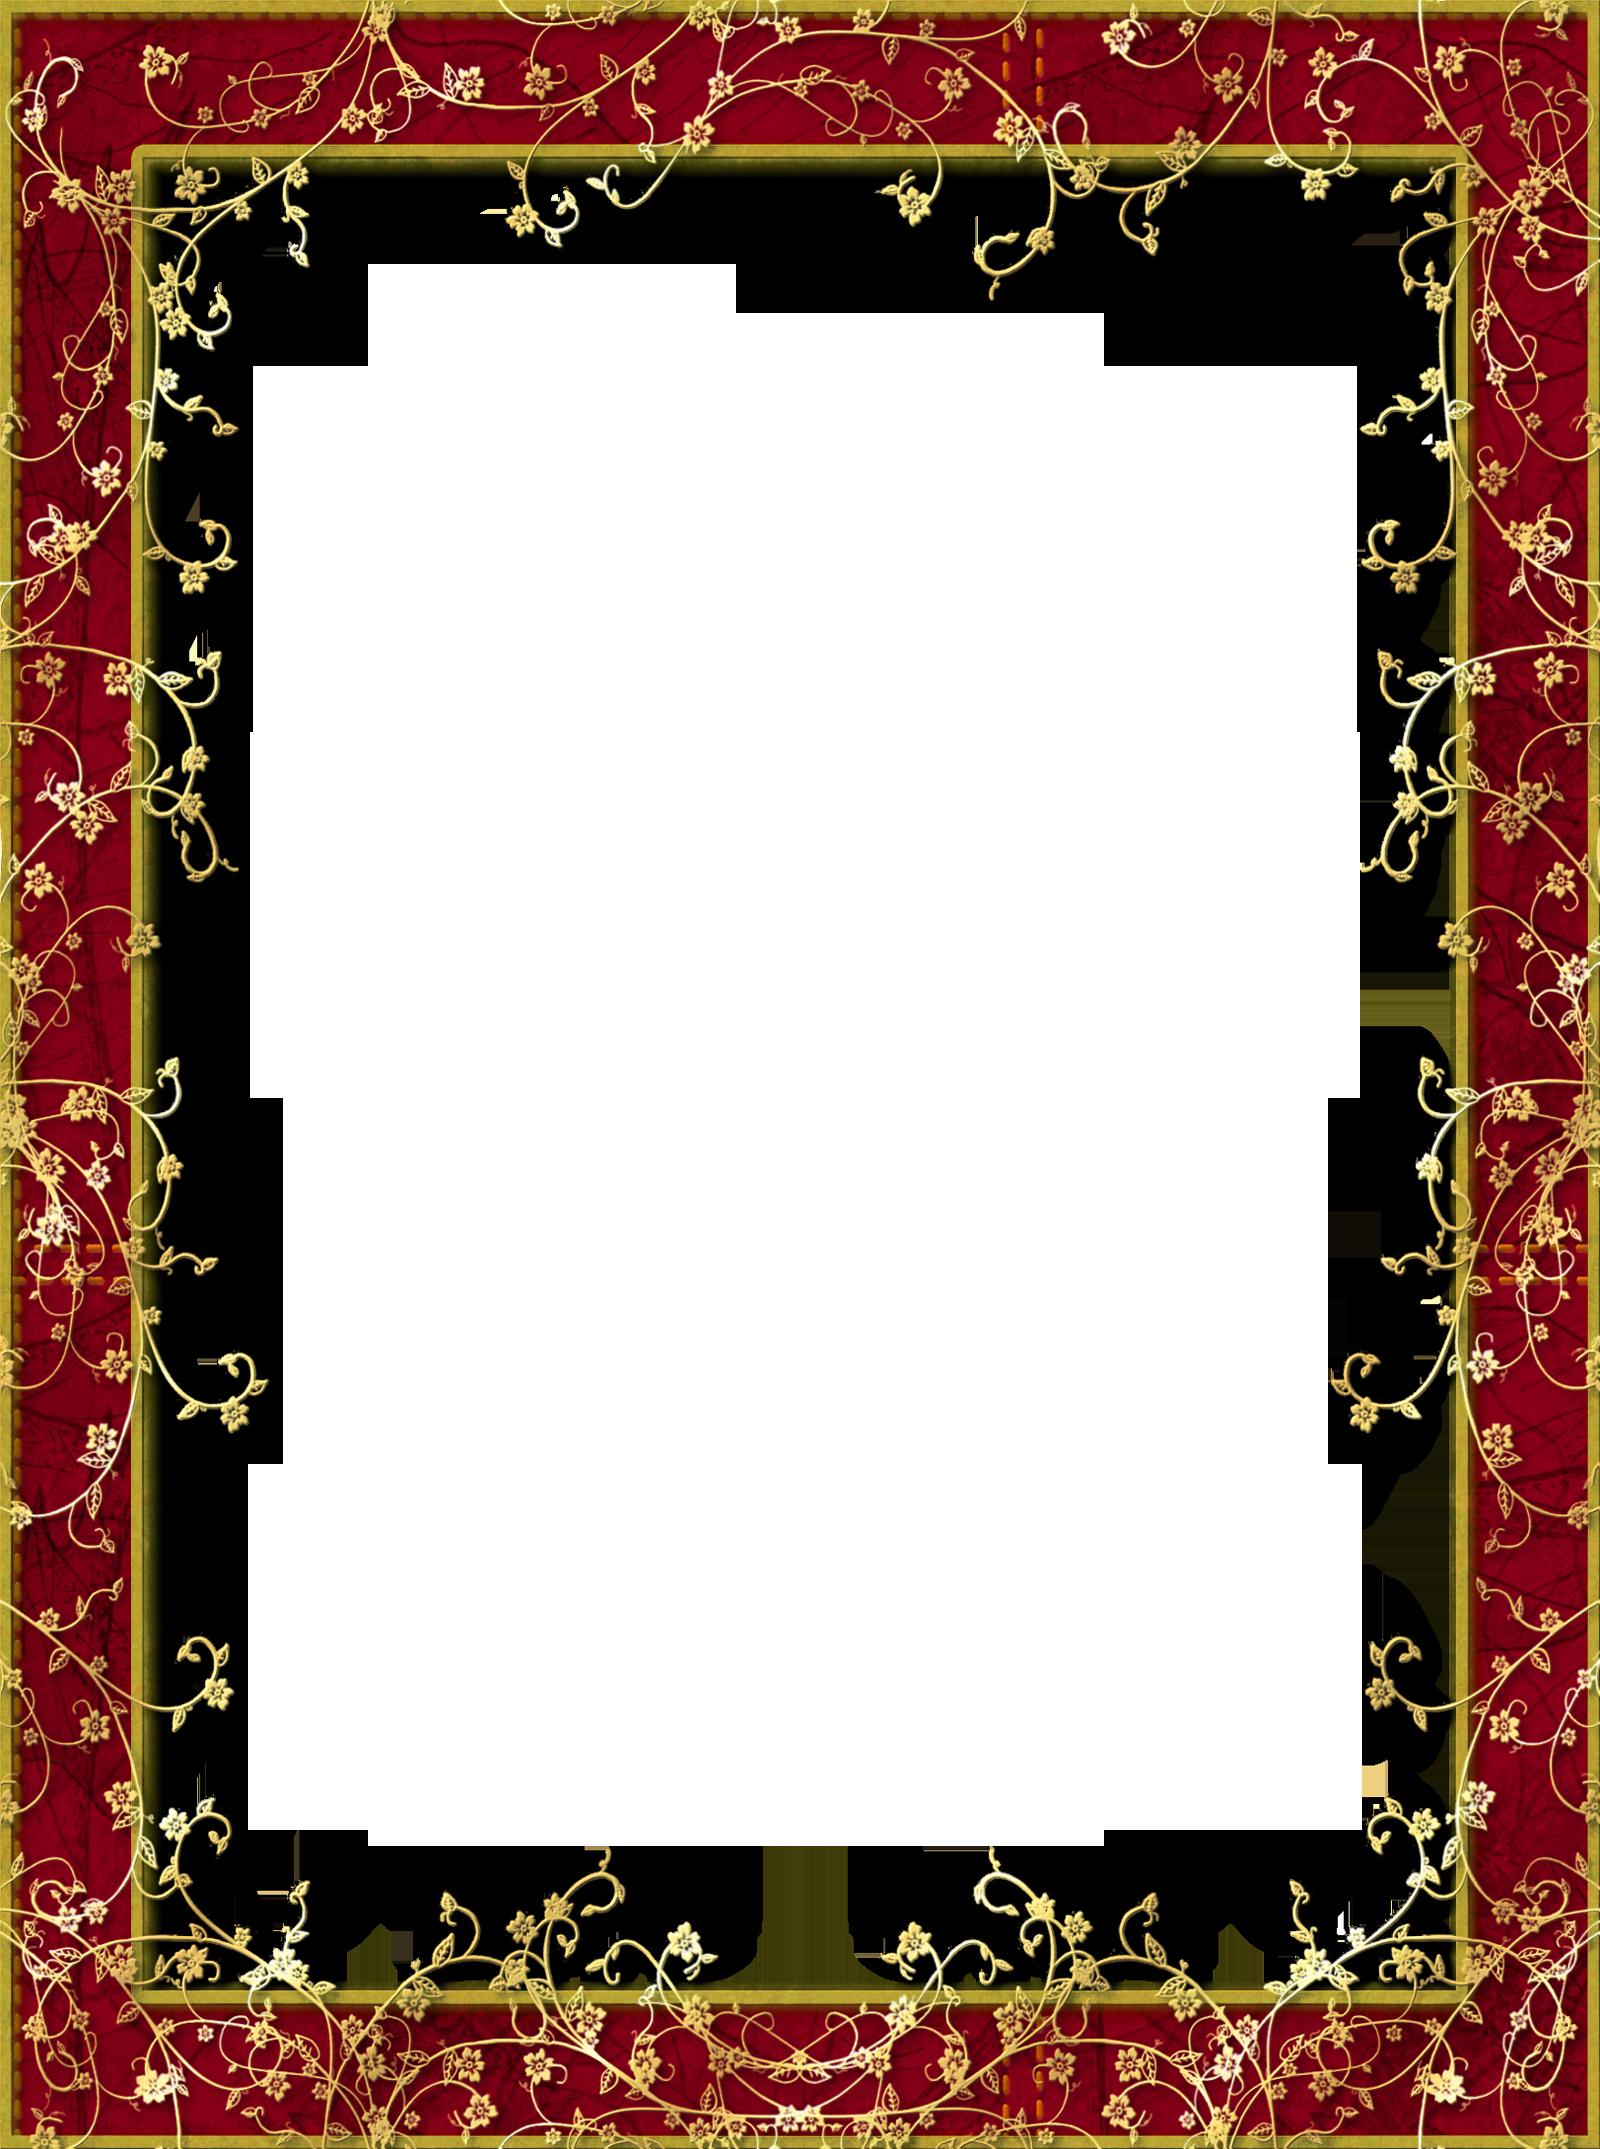 Red Transparent Png Frame With Gold Flowers Christmas Photo Frame Flower Frame Frame